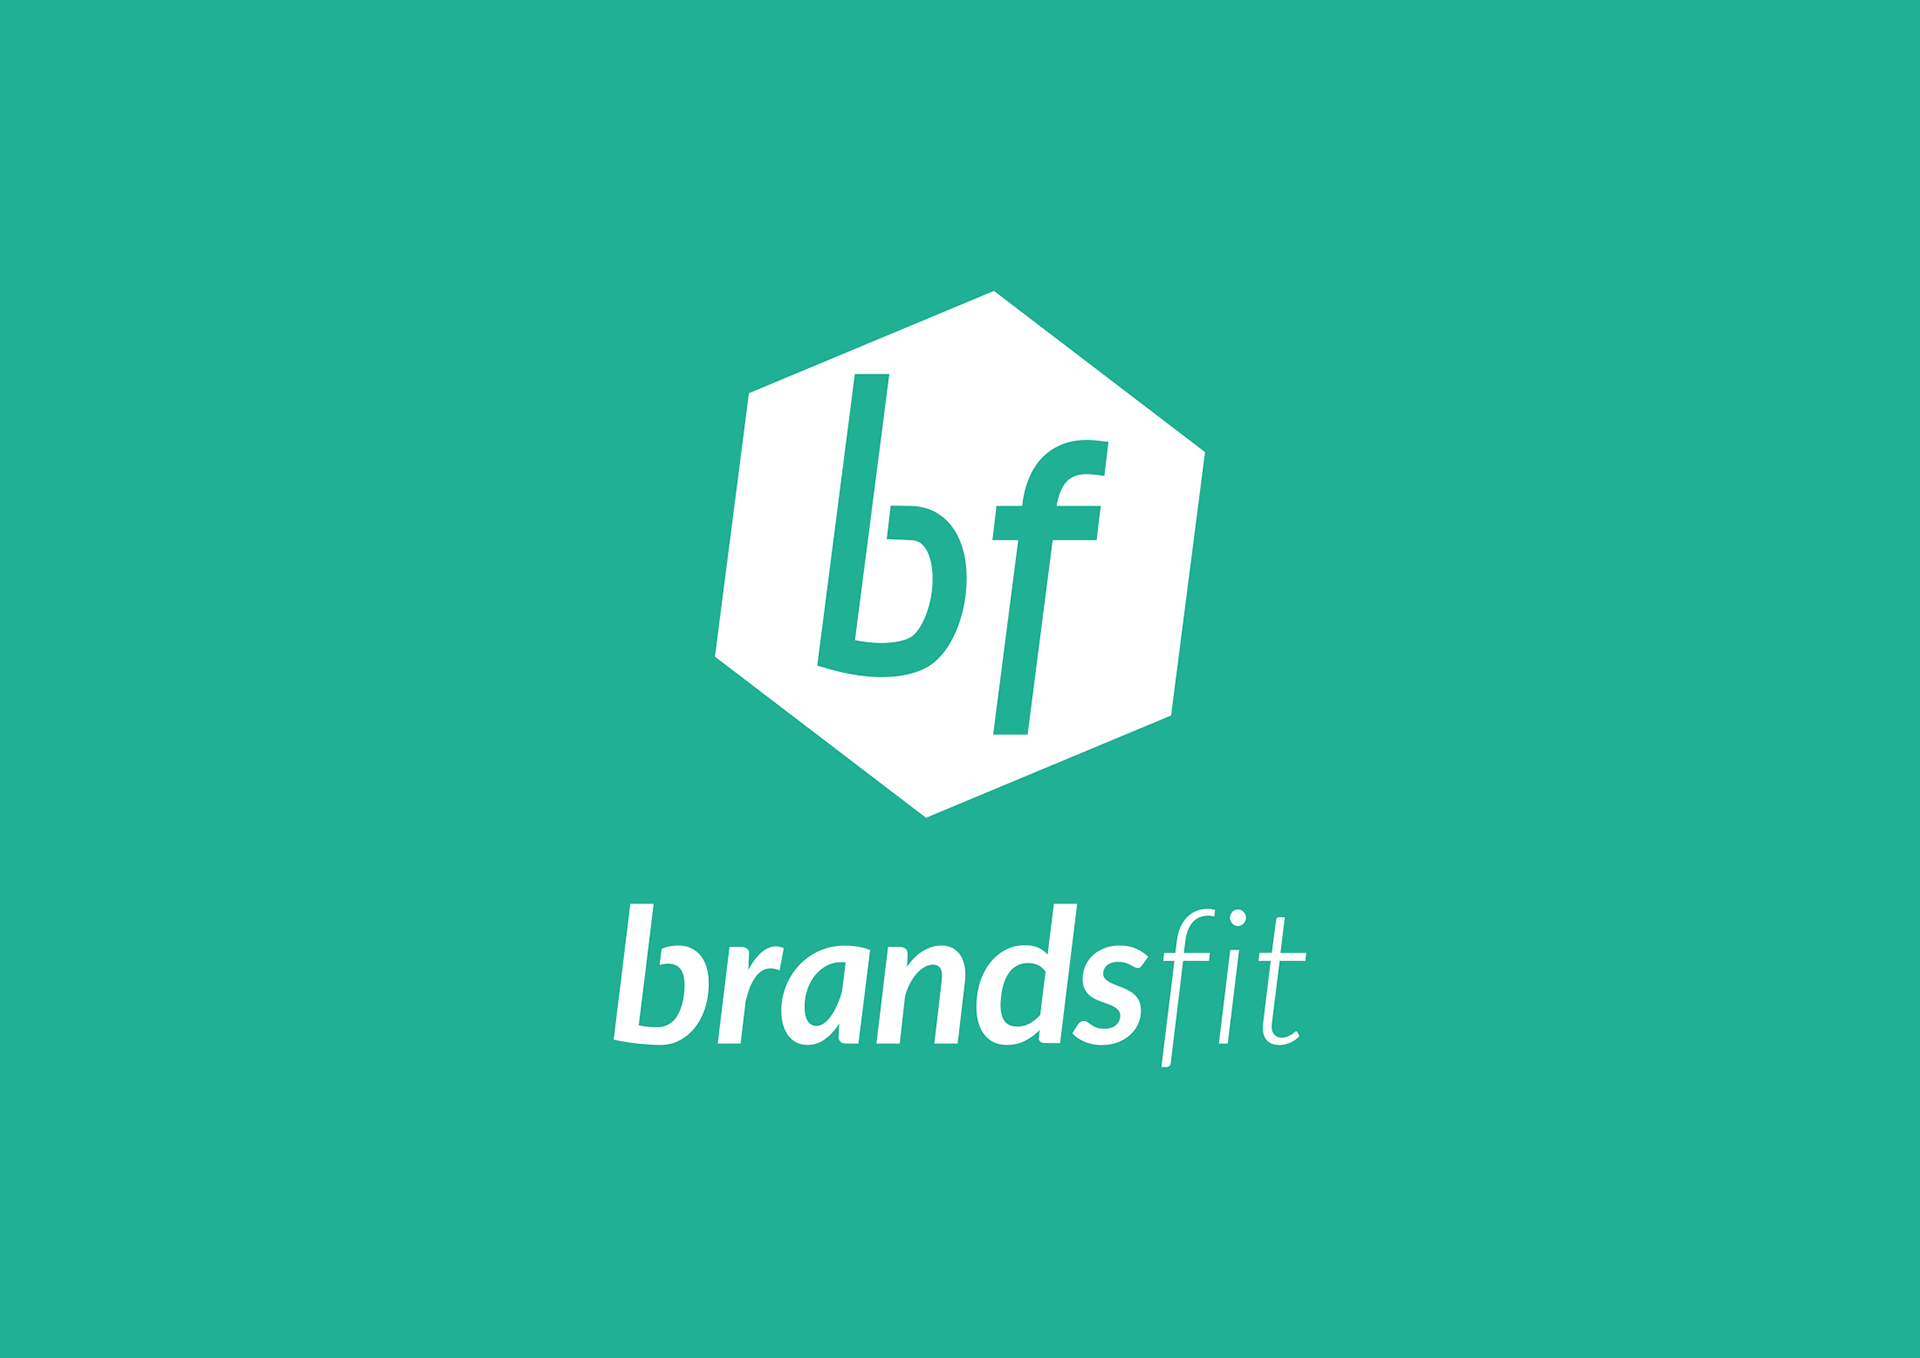 Brandsfit logo in white on green